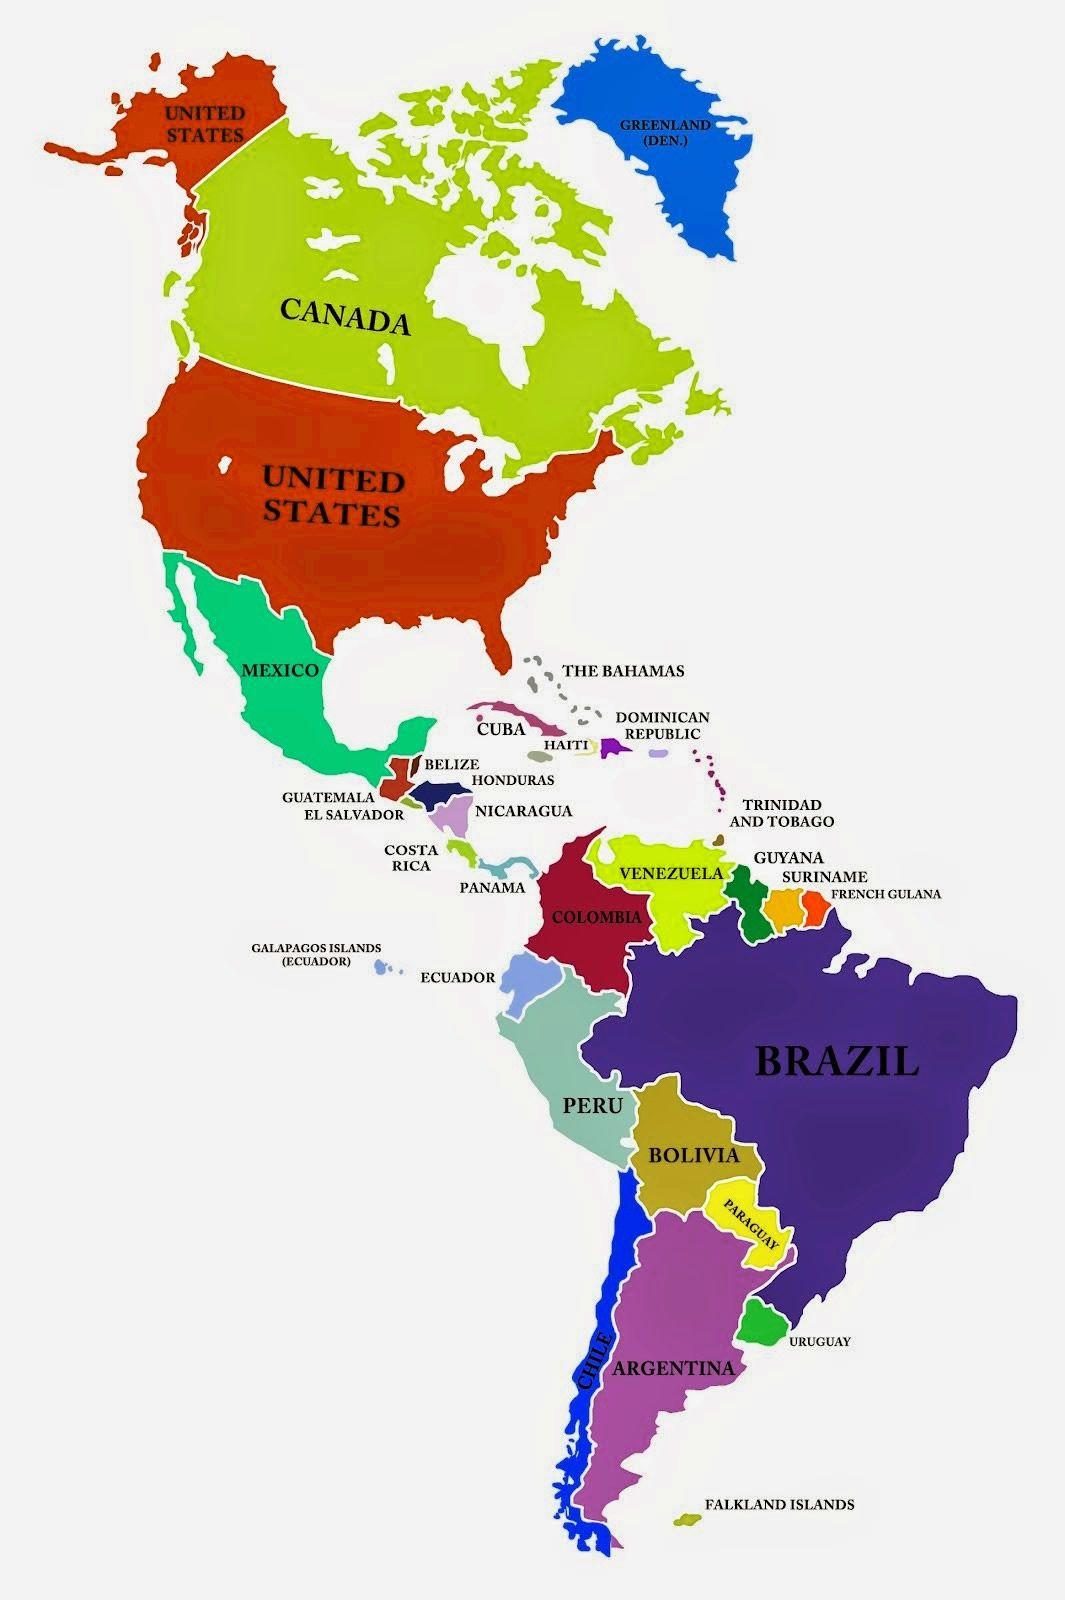 Particular Mapa America Completo Paises Y Capitales De America Mapa Politico De America Del Ce Mapa De America Continente De America America Paises Y Capitales